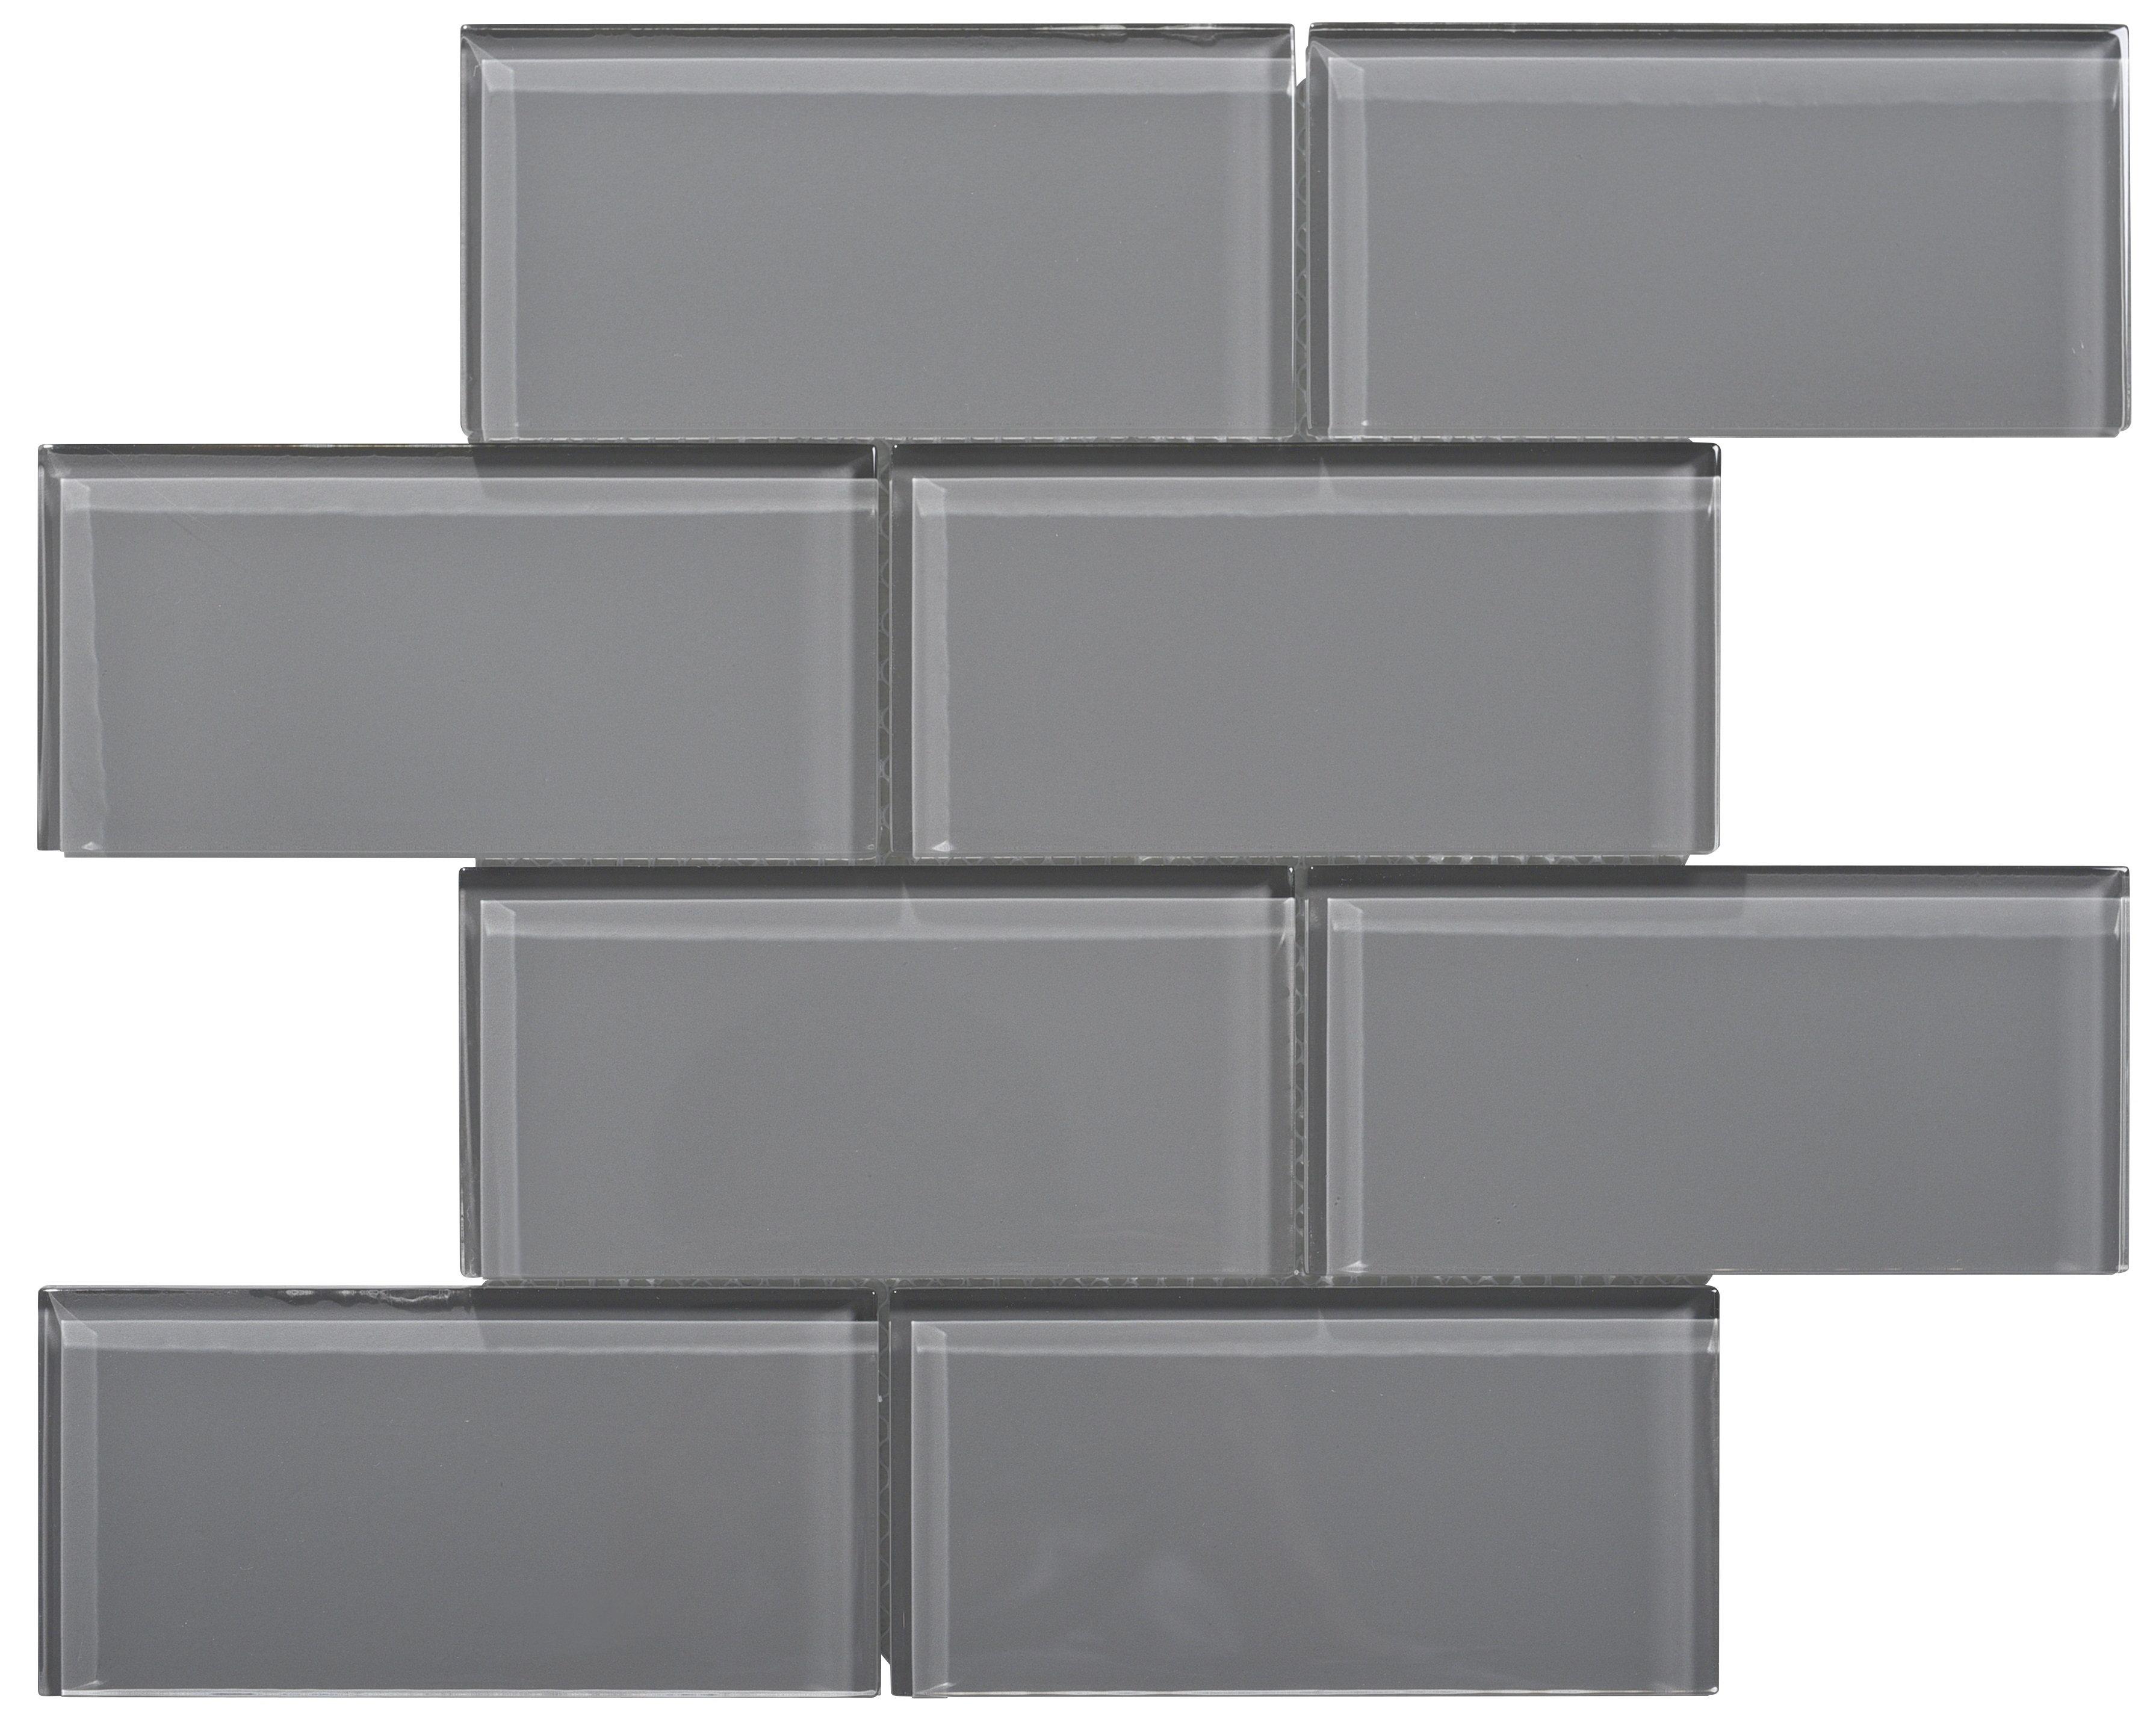 WS Tiles Premium Series X Glass Subway Tile In Dark Gray - Dark gray rectangular floor tile